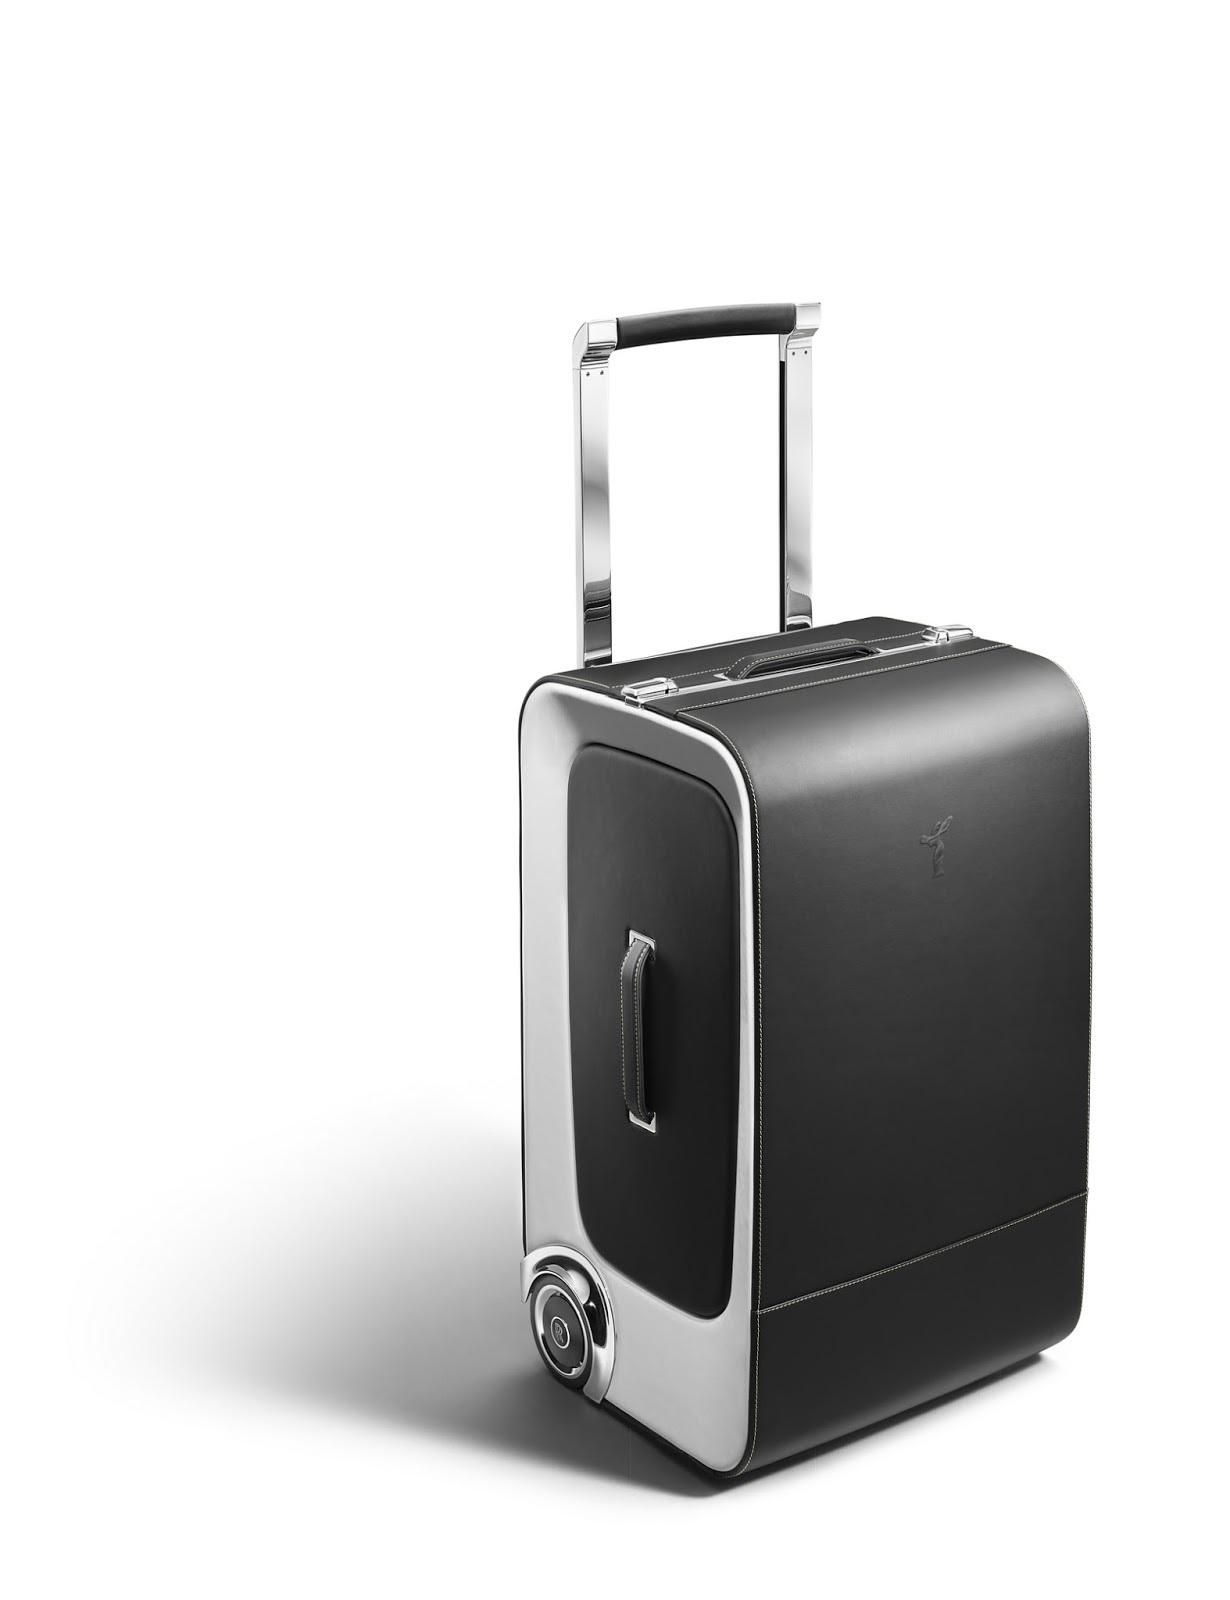 Foto de Rolls-Royce - Set de maletas (2/9)